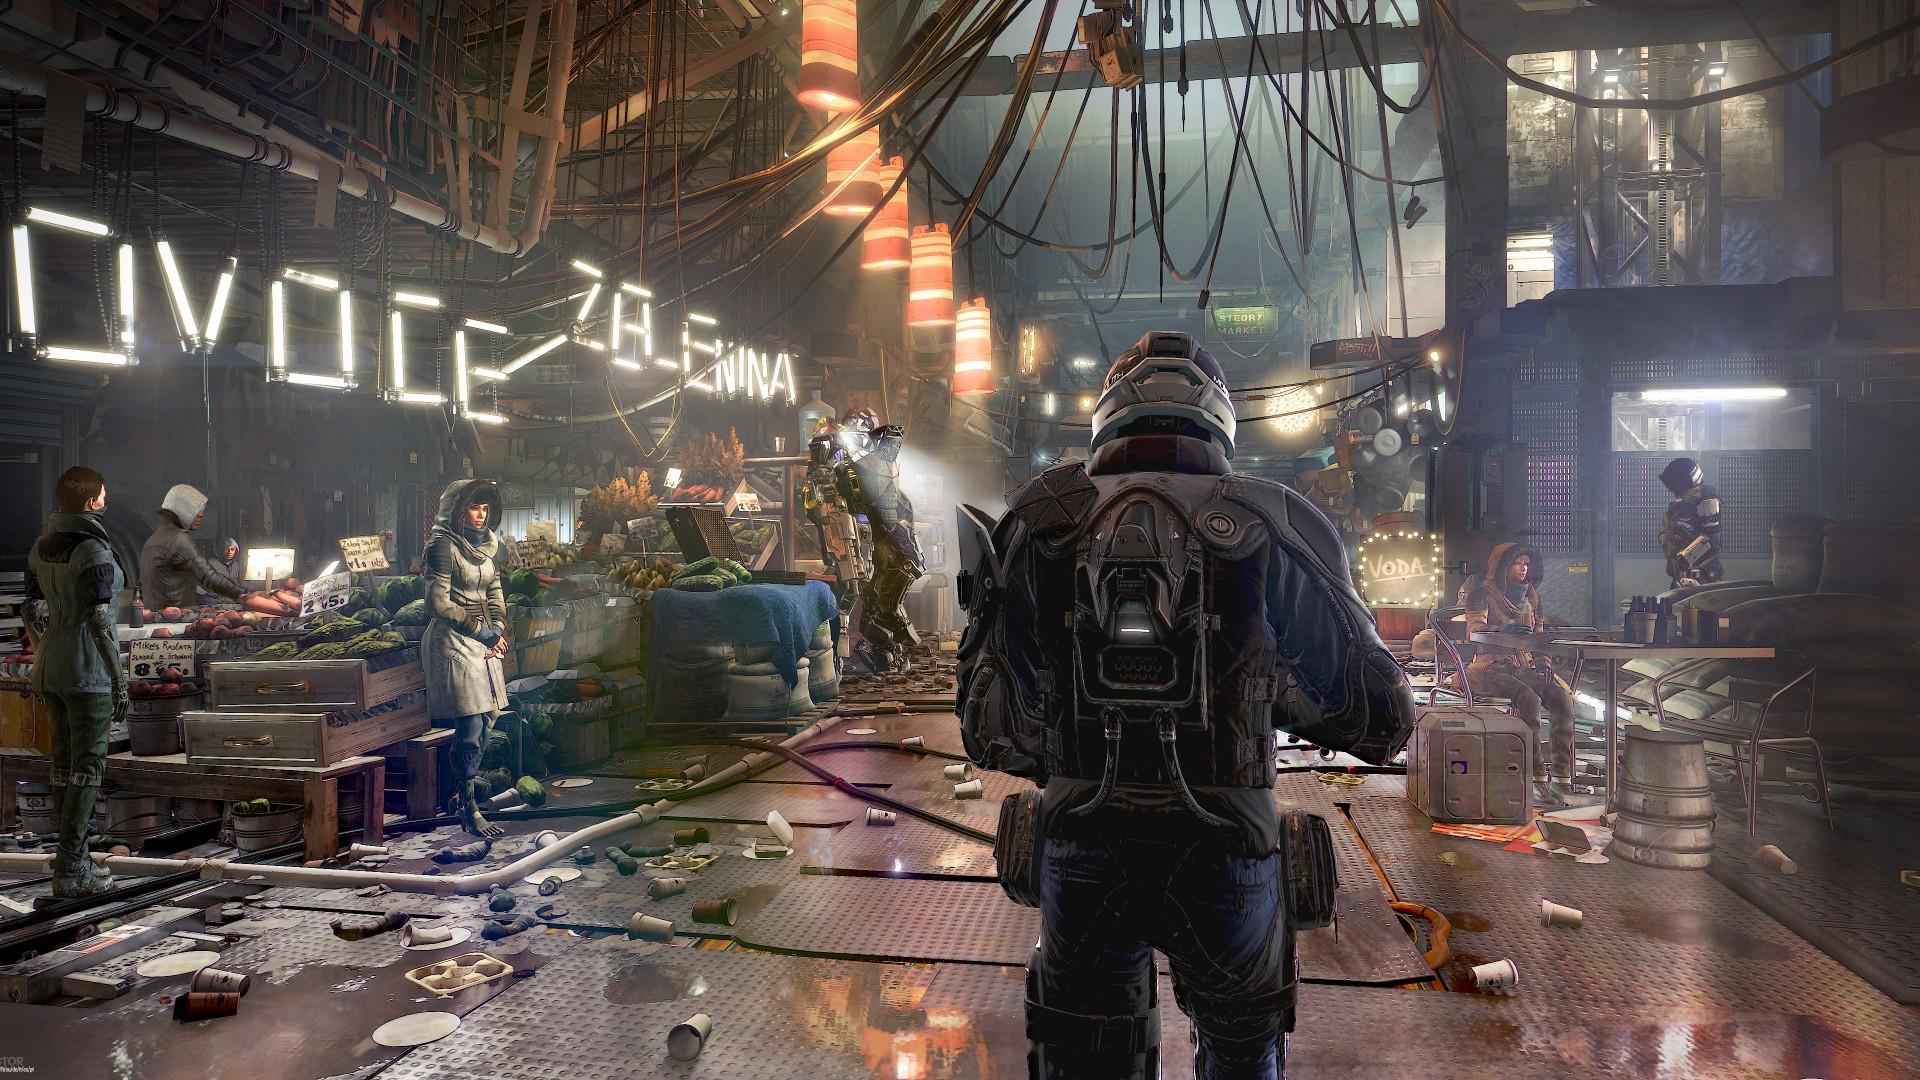 3d Wallpaper Shaft Deus Ex Mankind Divided 4k Gameplay Wallpapers Hd